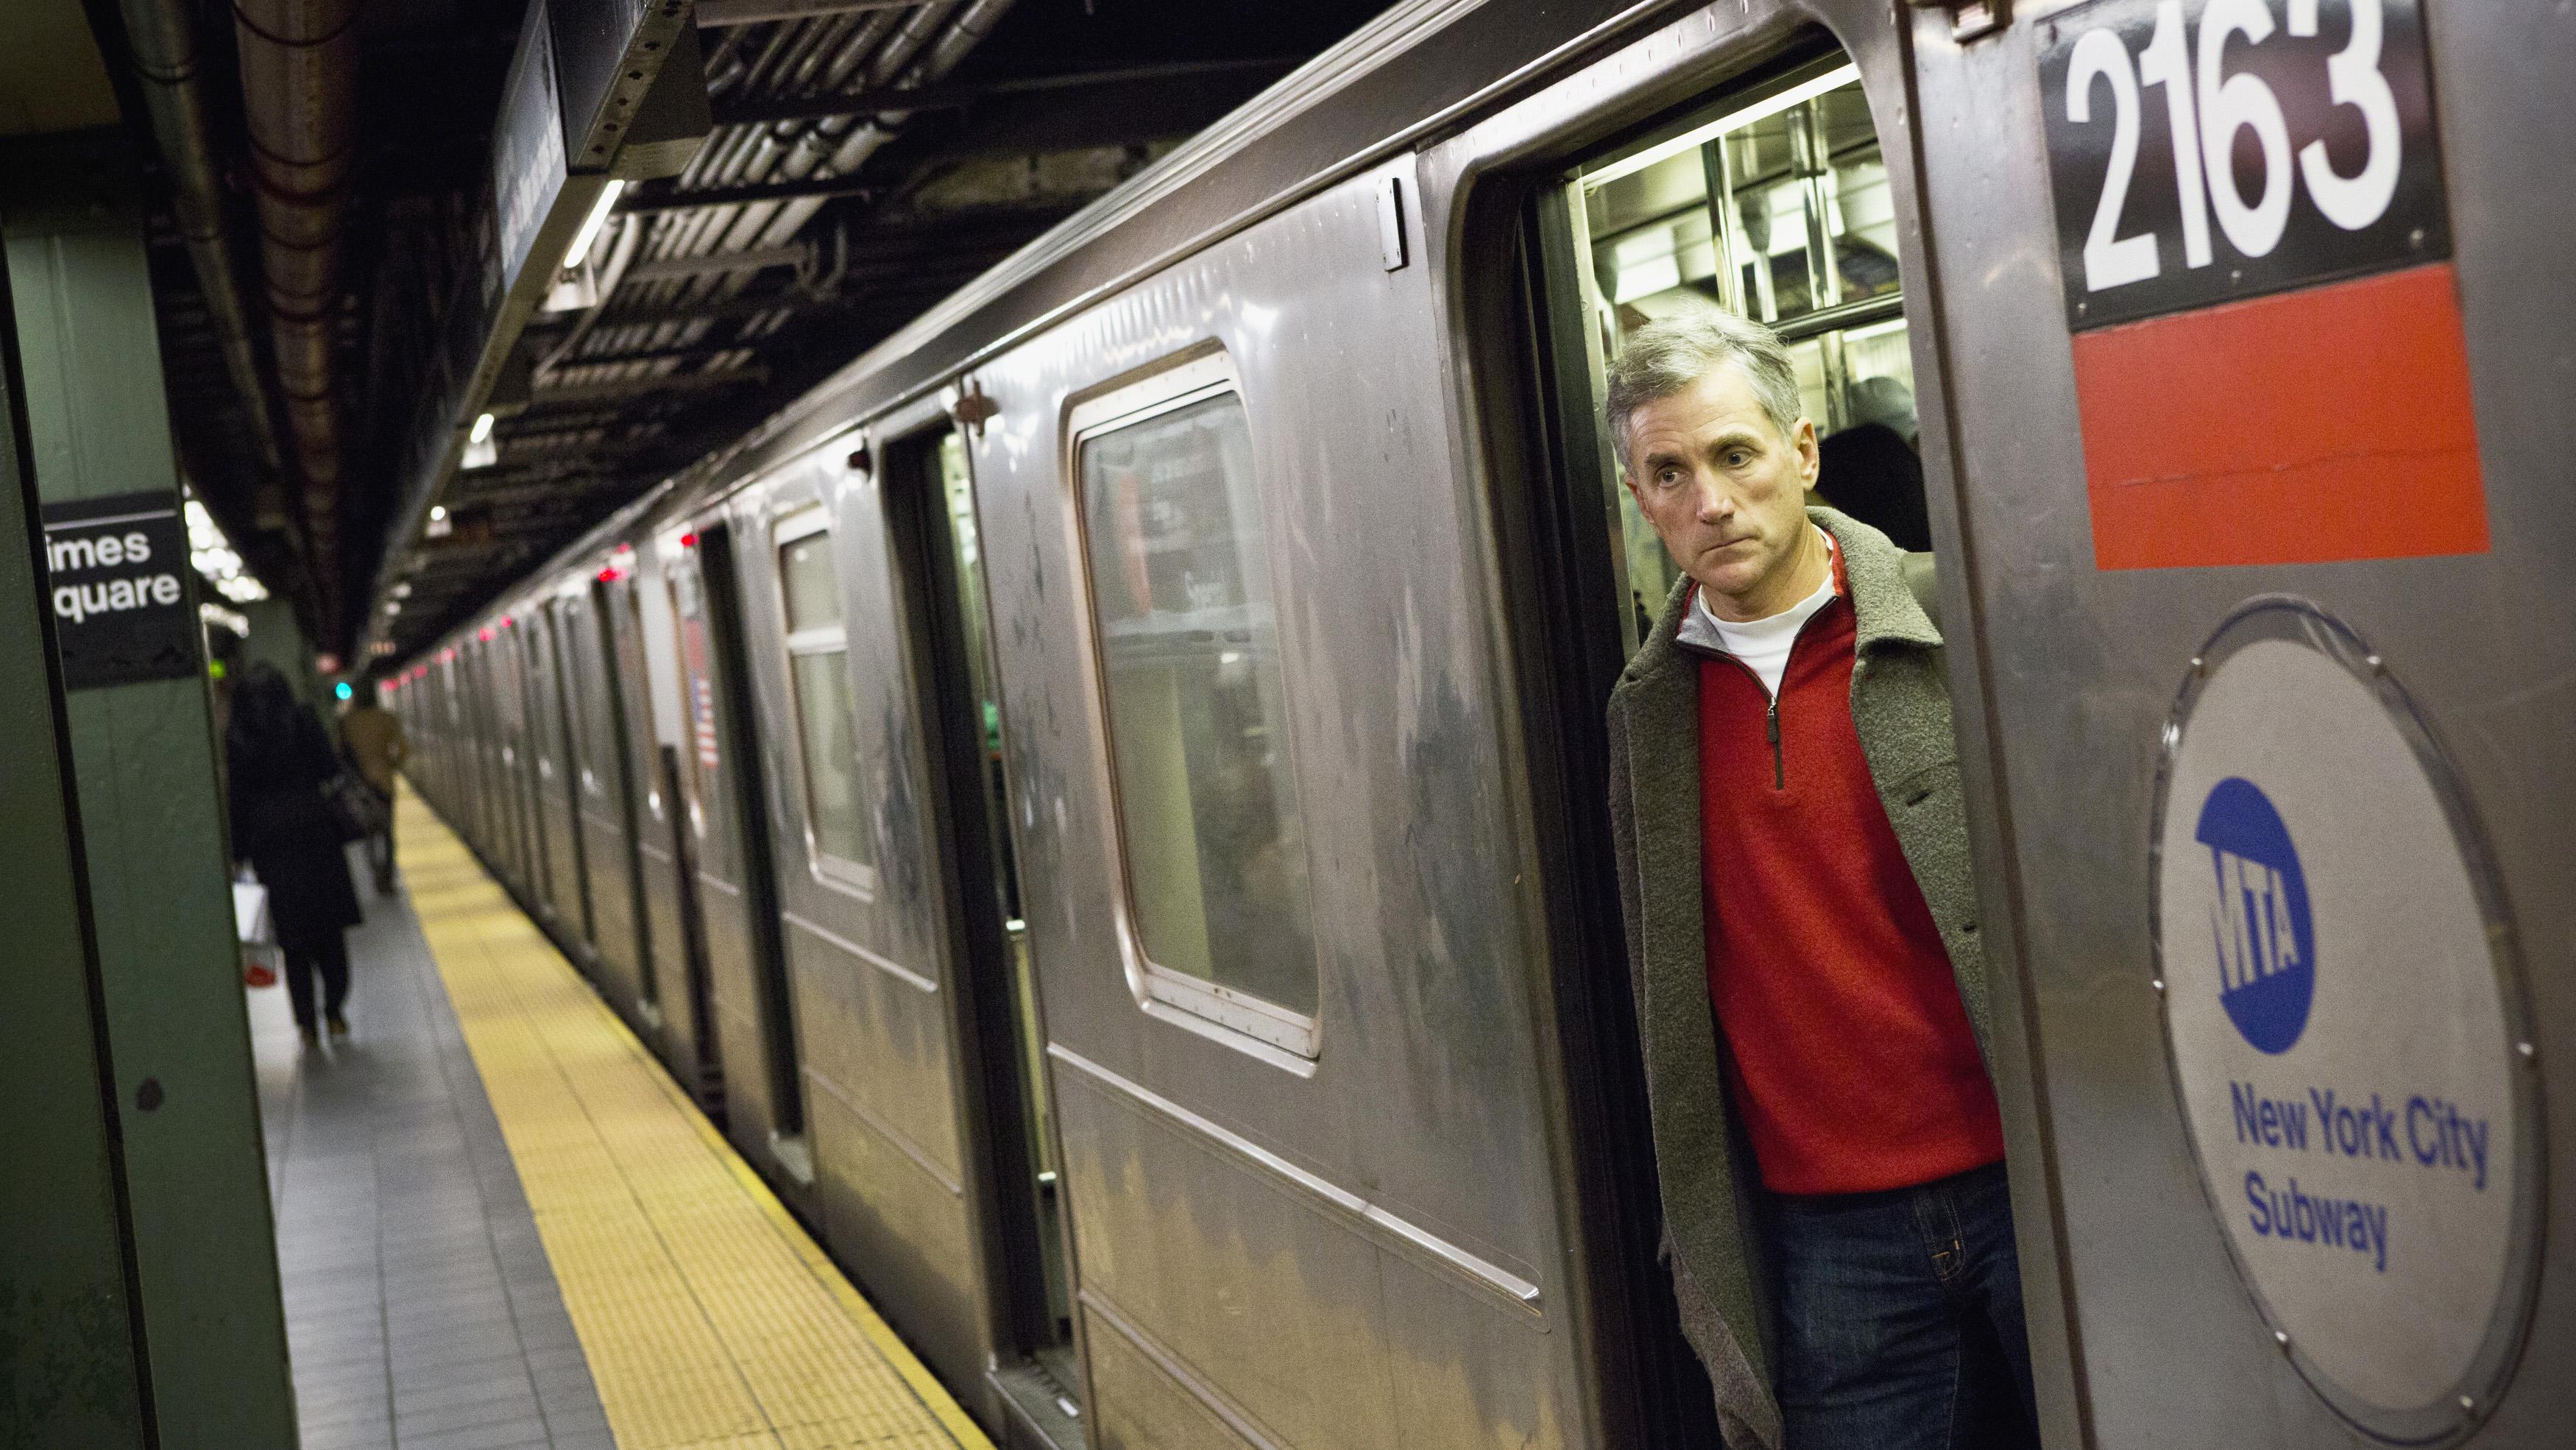 Honest New York City subway announcements — Quartz